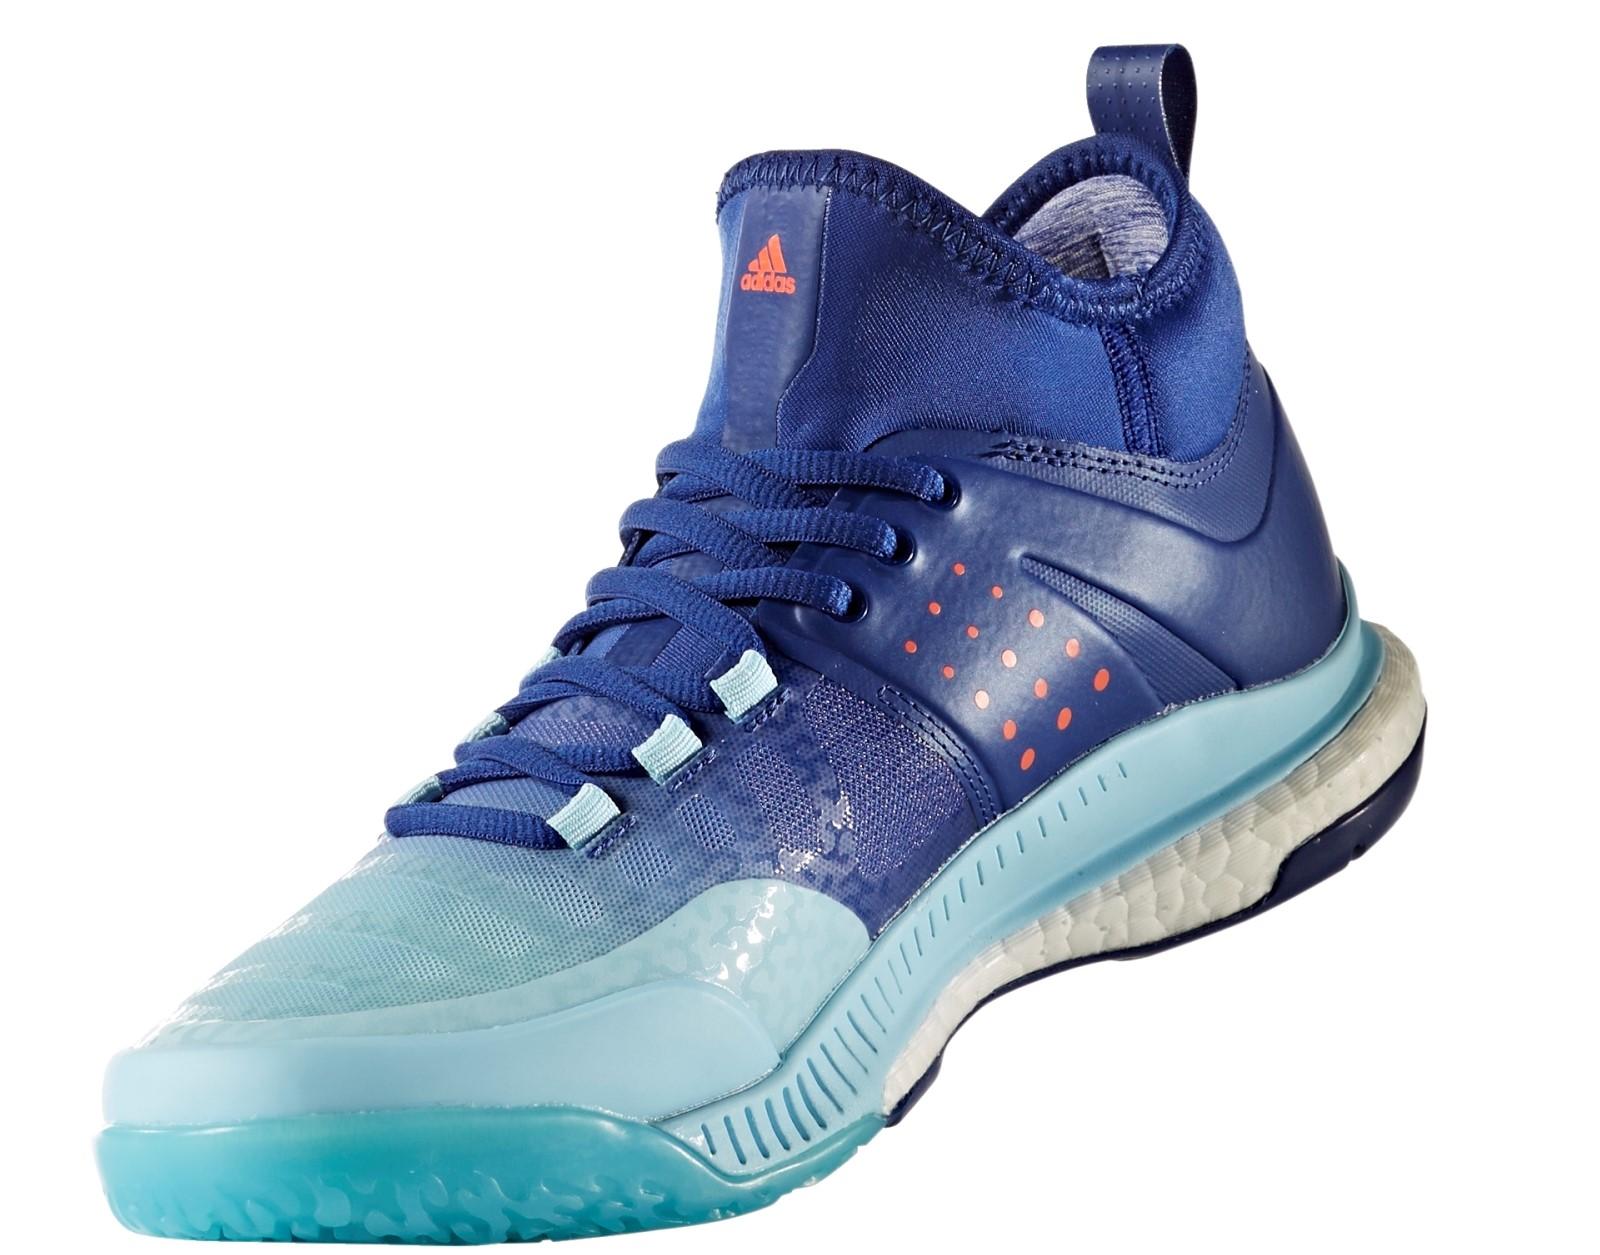 4b1fa4a4bf7 Dámské volejbalové boty adidas CRAZYFLIGHT X MID W modré